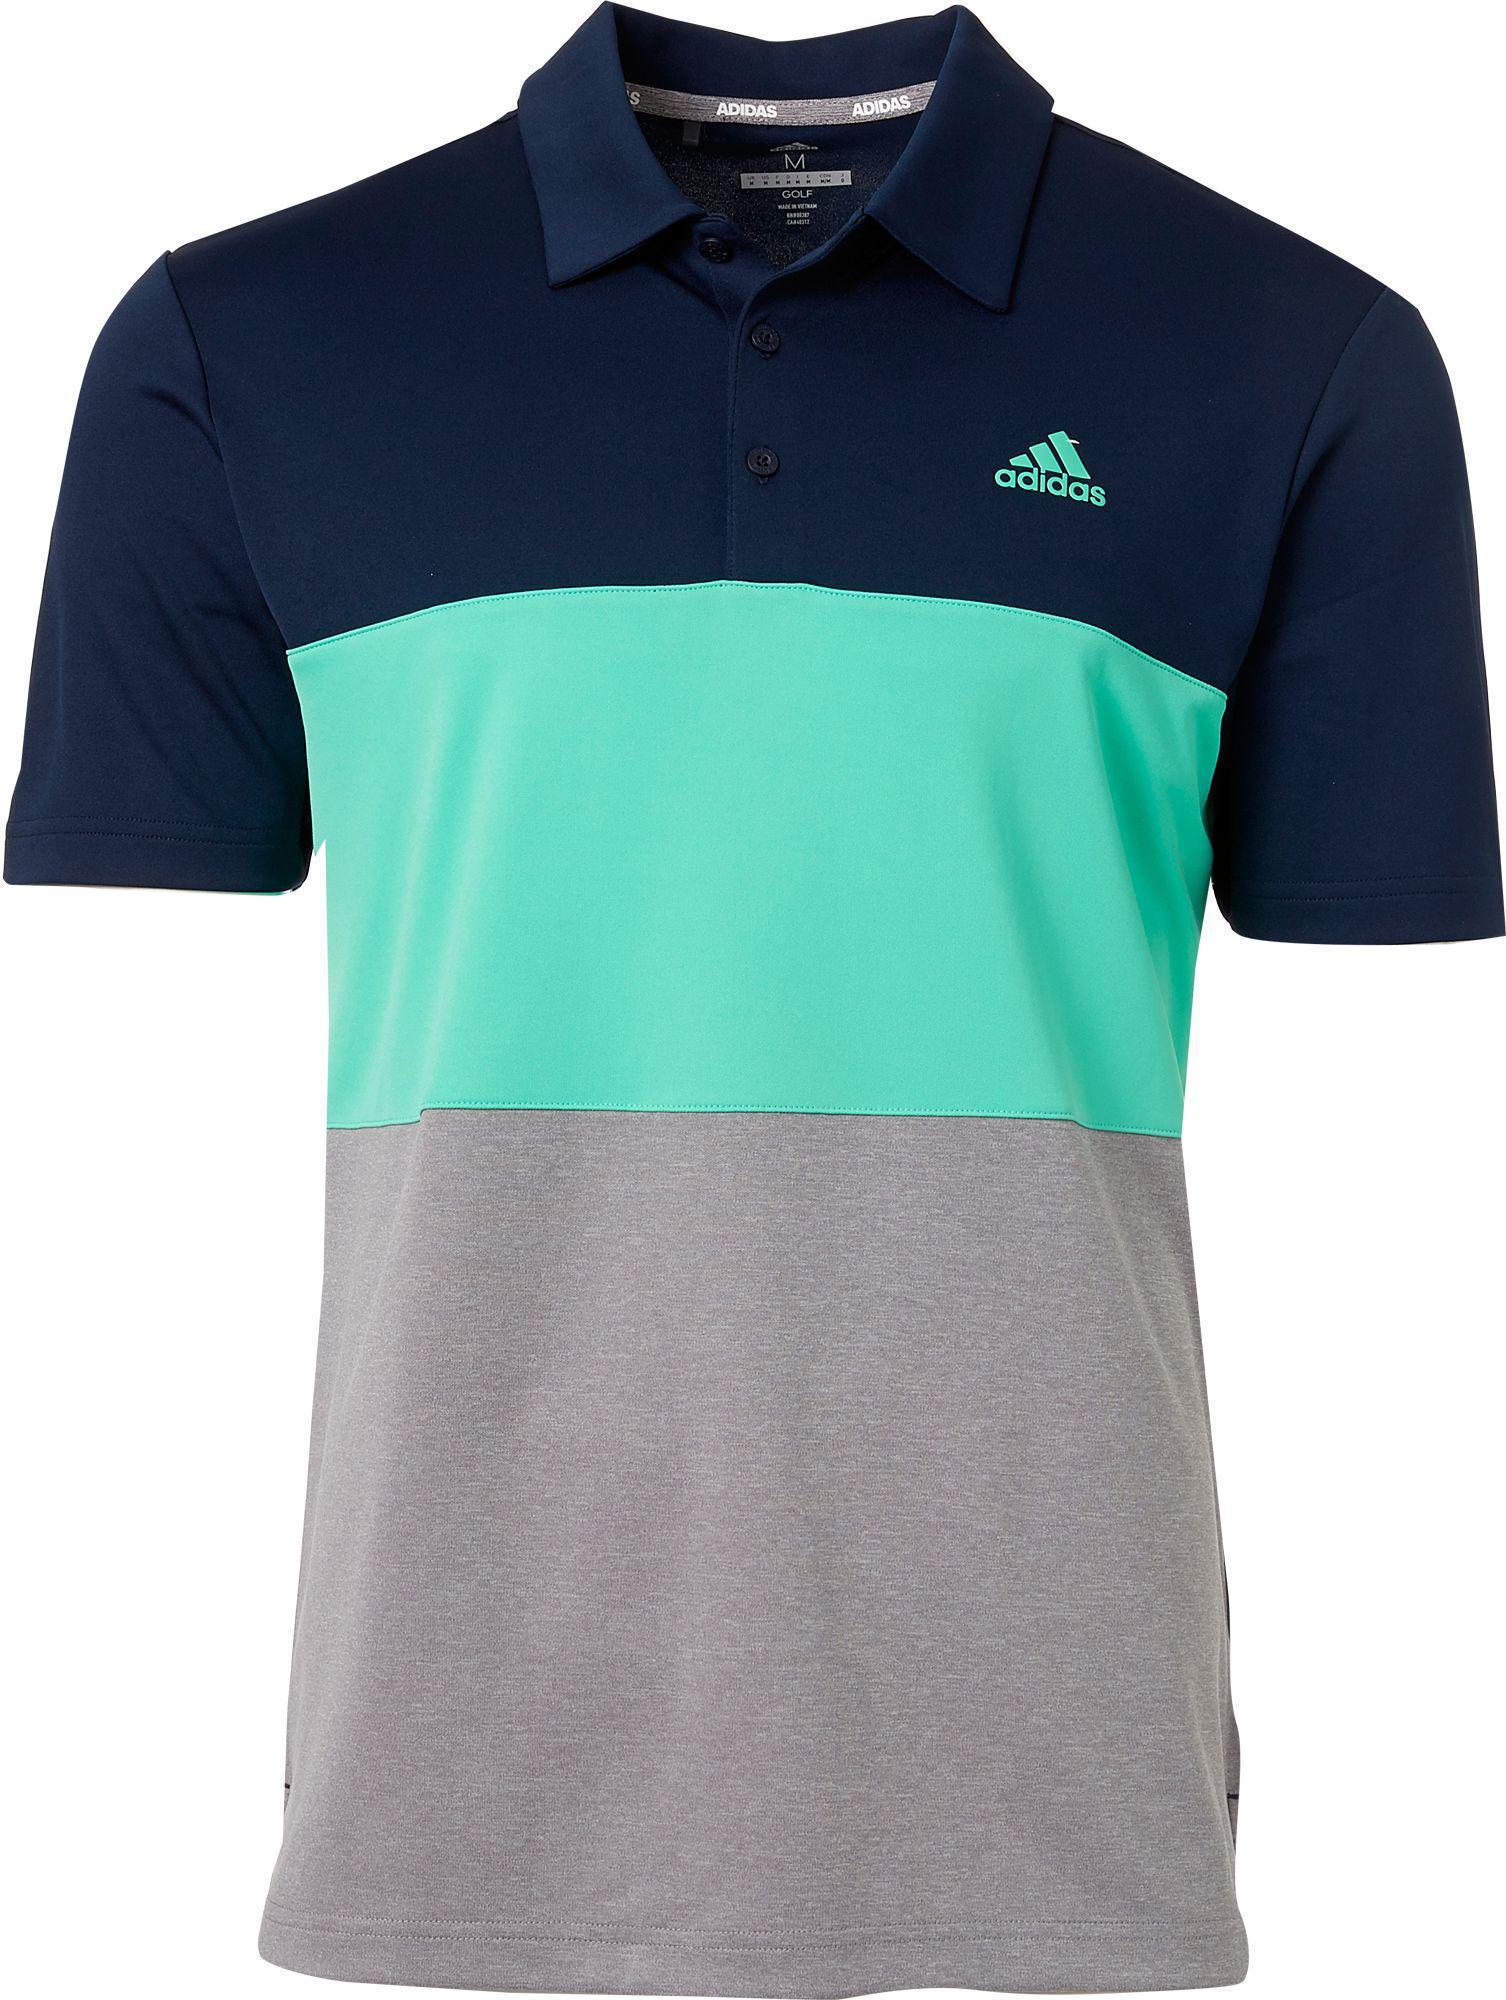 Callaway Polo Shirts Amazon